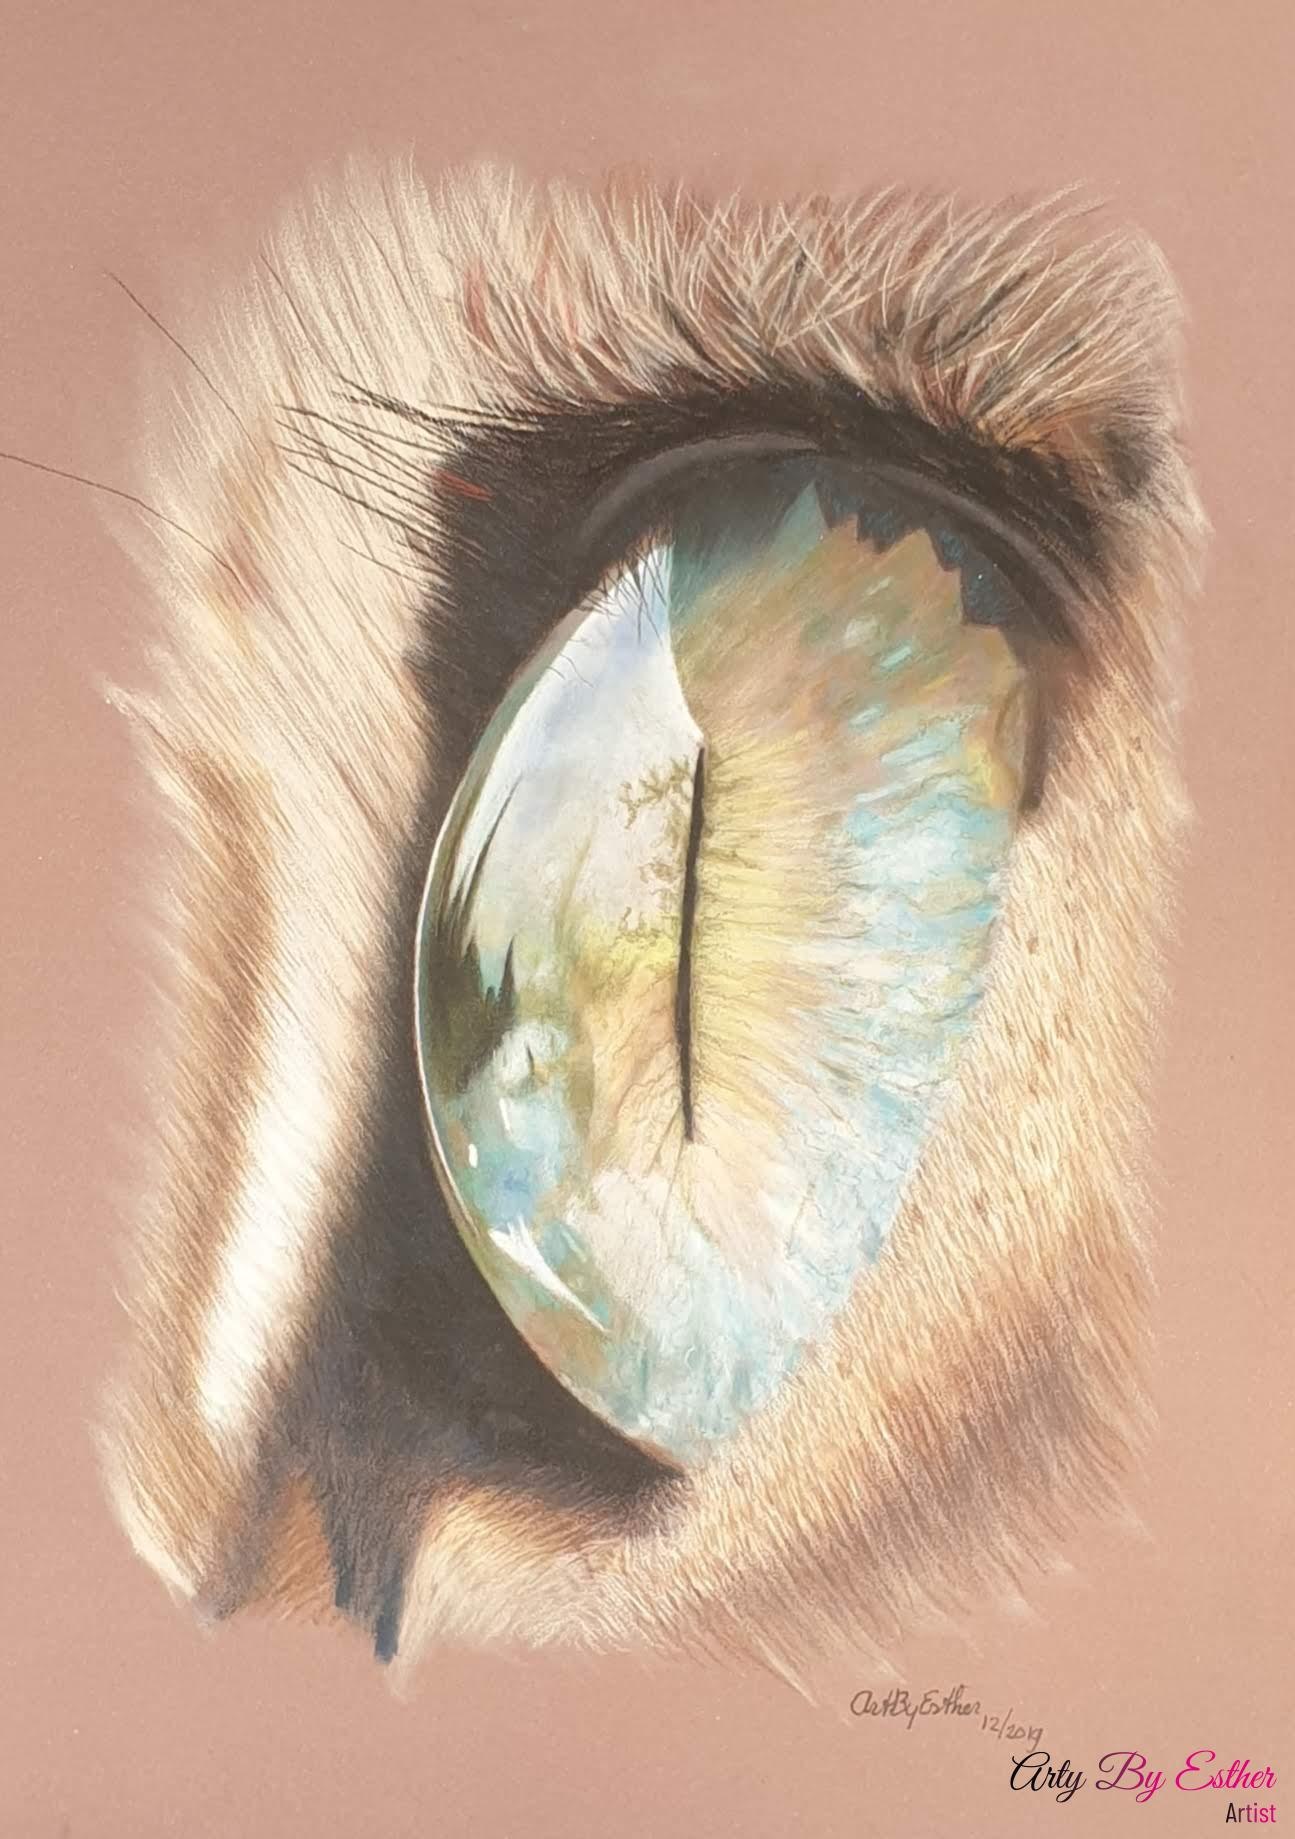 Cat's eye pastelpainting